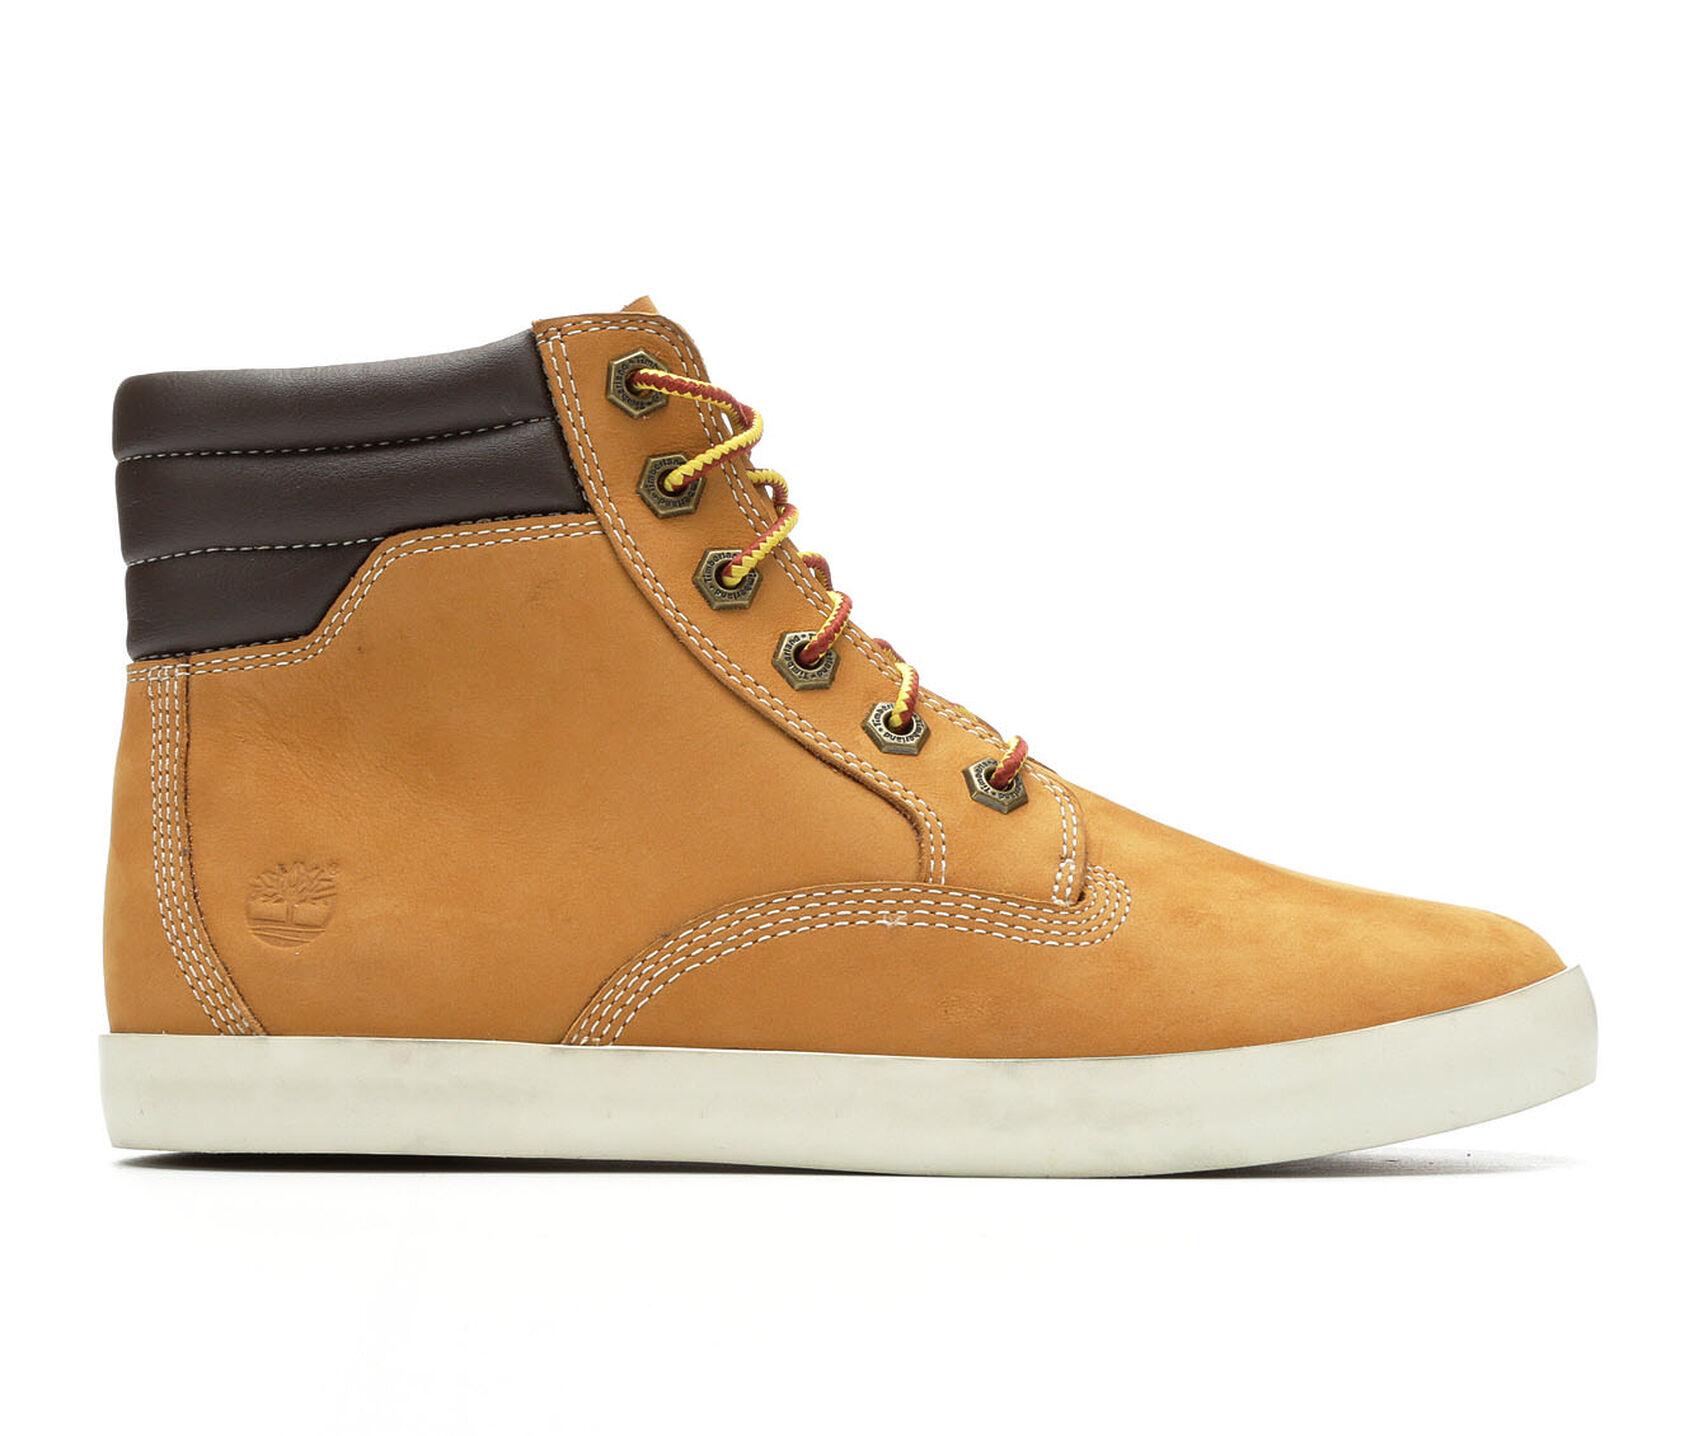 4d0d372a9 Women's Timberland Dausette Sneaker Boots | Shoe Carnival